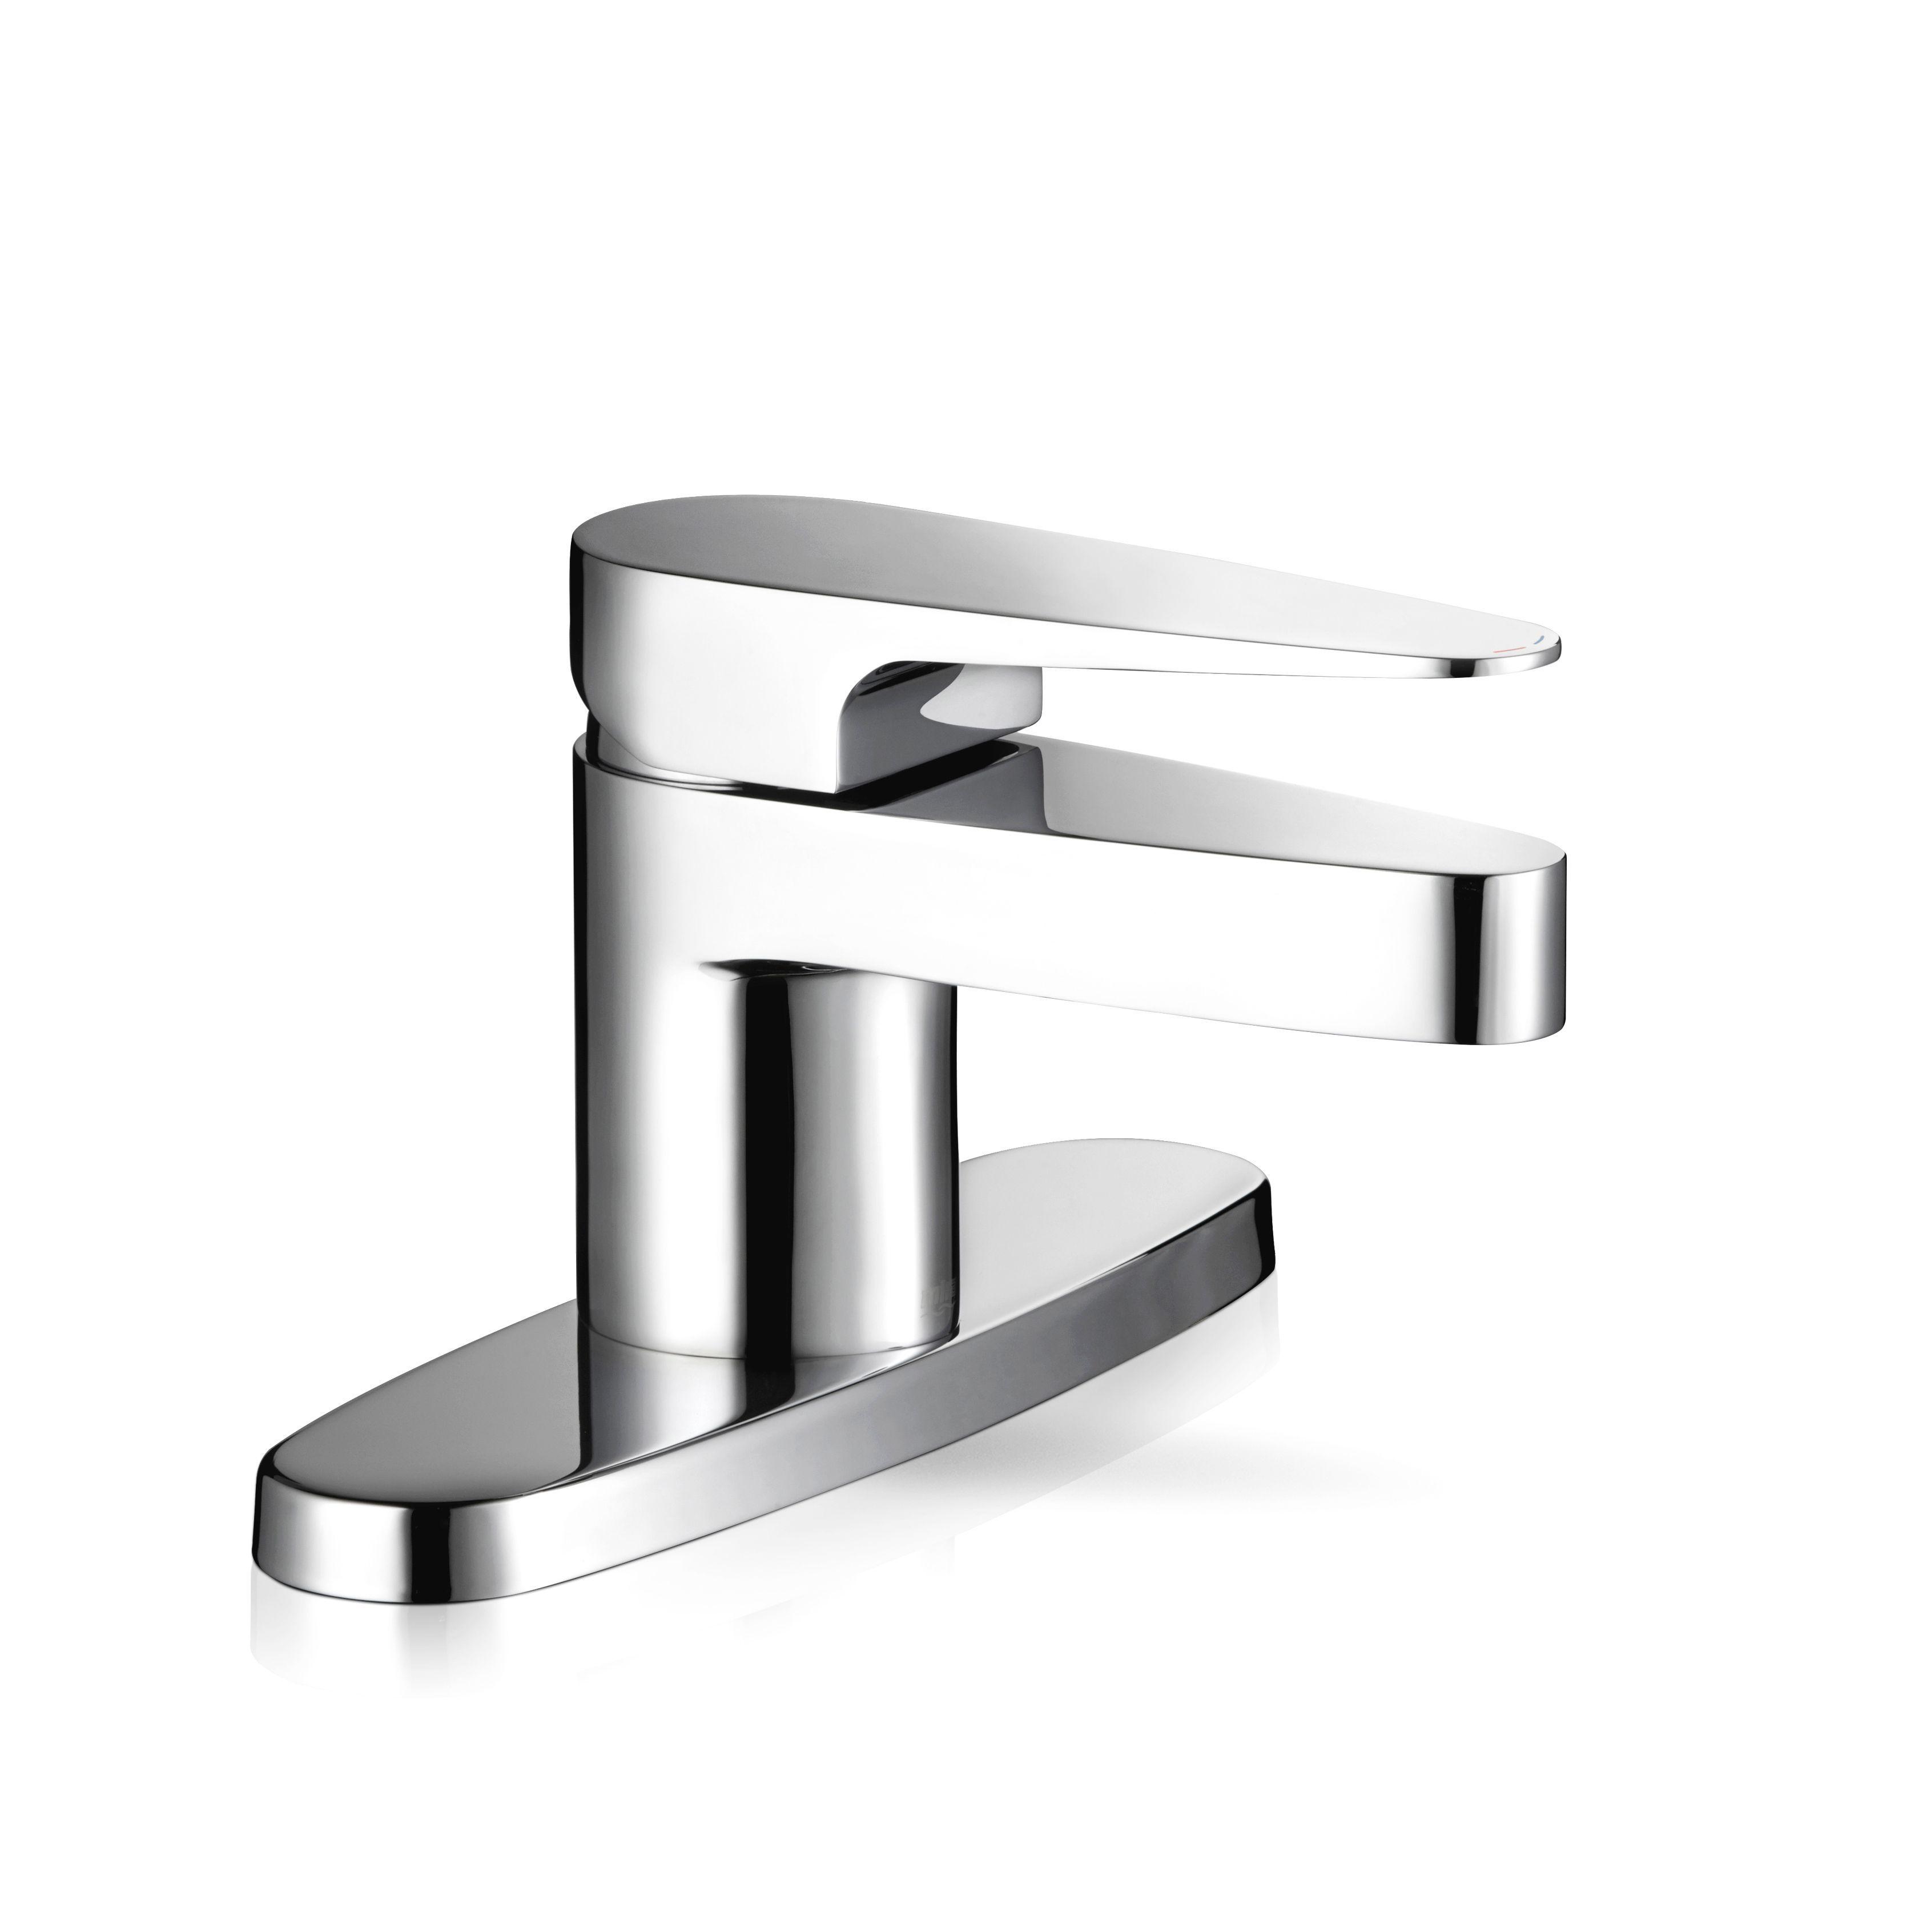 Mira Precision Chrome Bath Mixer Tap